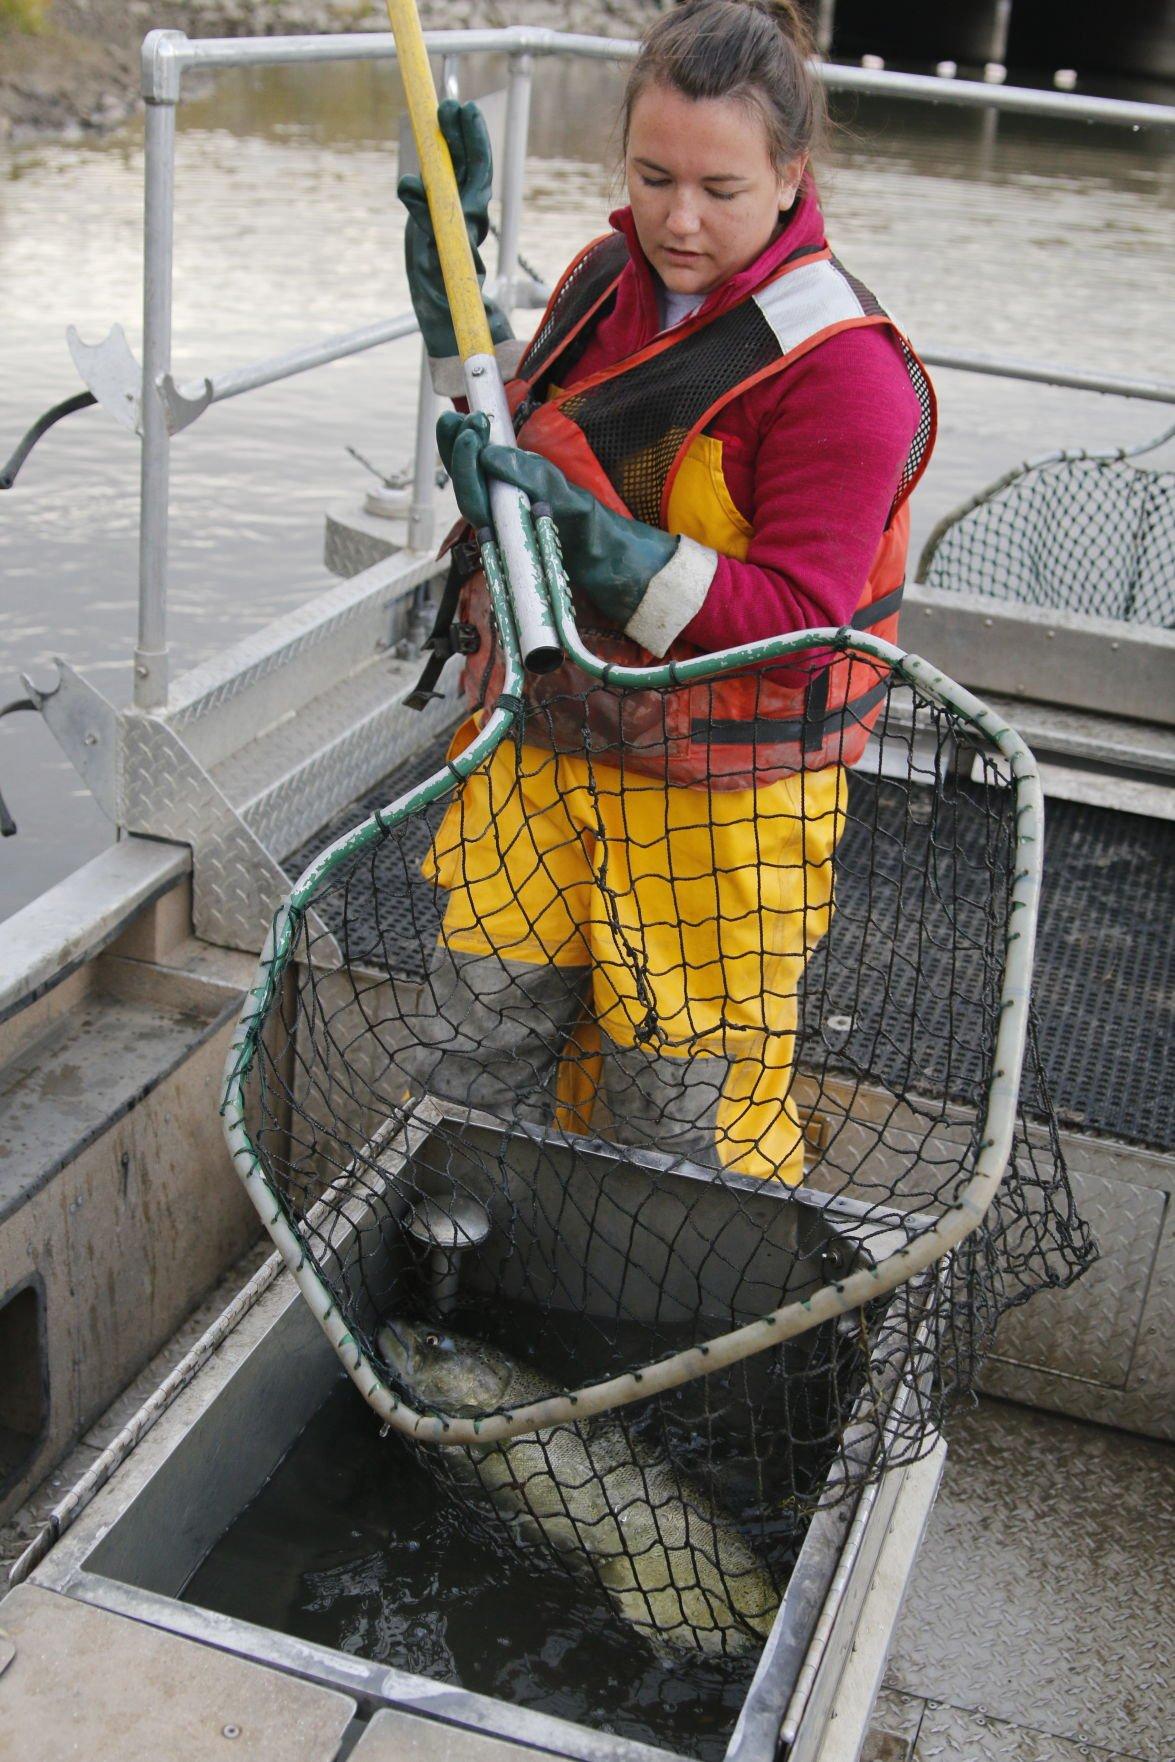 Lake Oahe Salmon Fishery Still Rebuilding After Flood